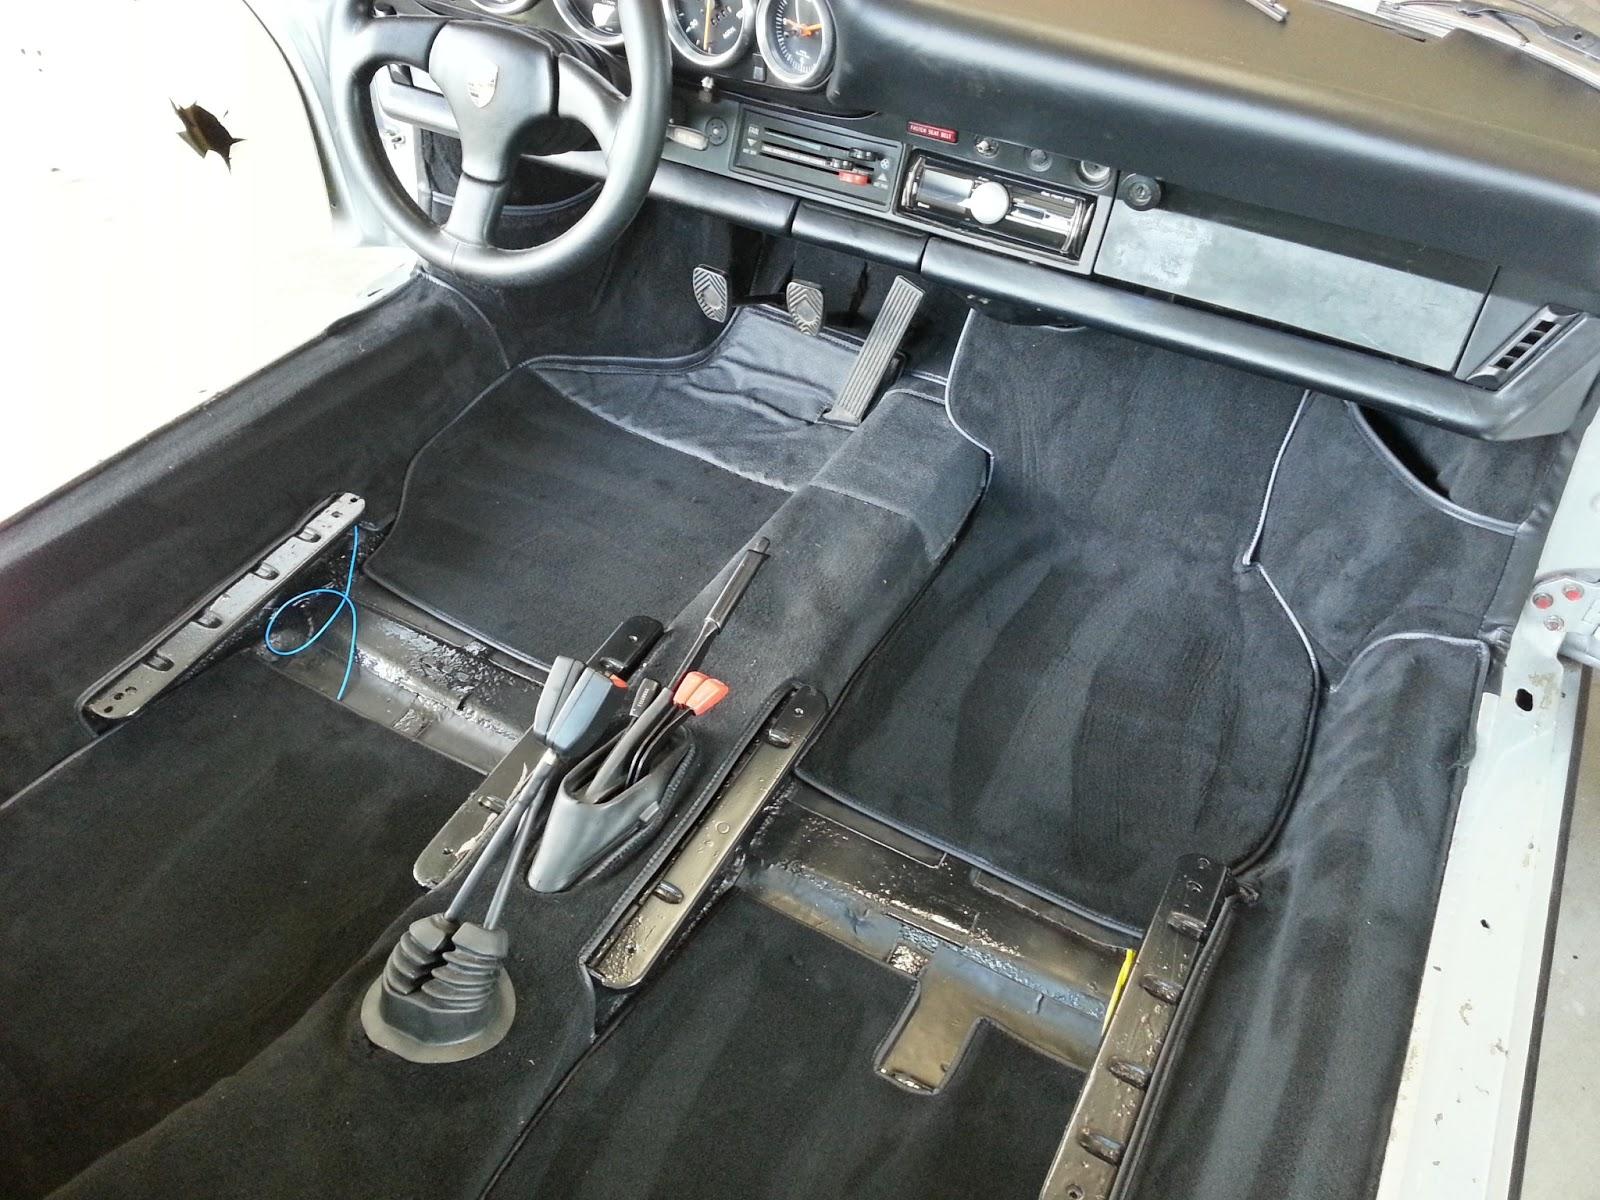 1975 Porsche 911 Targa Rebuild New Carpet